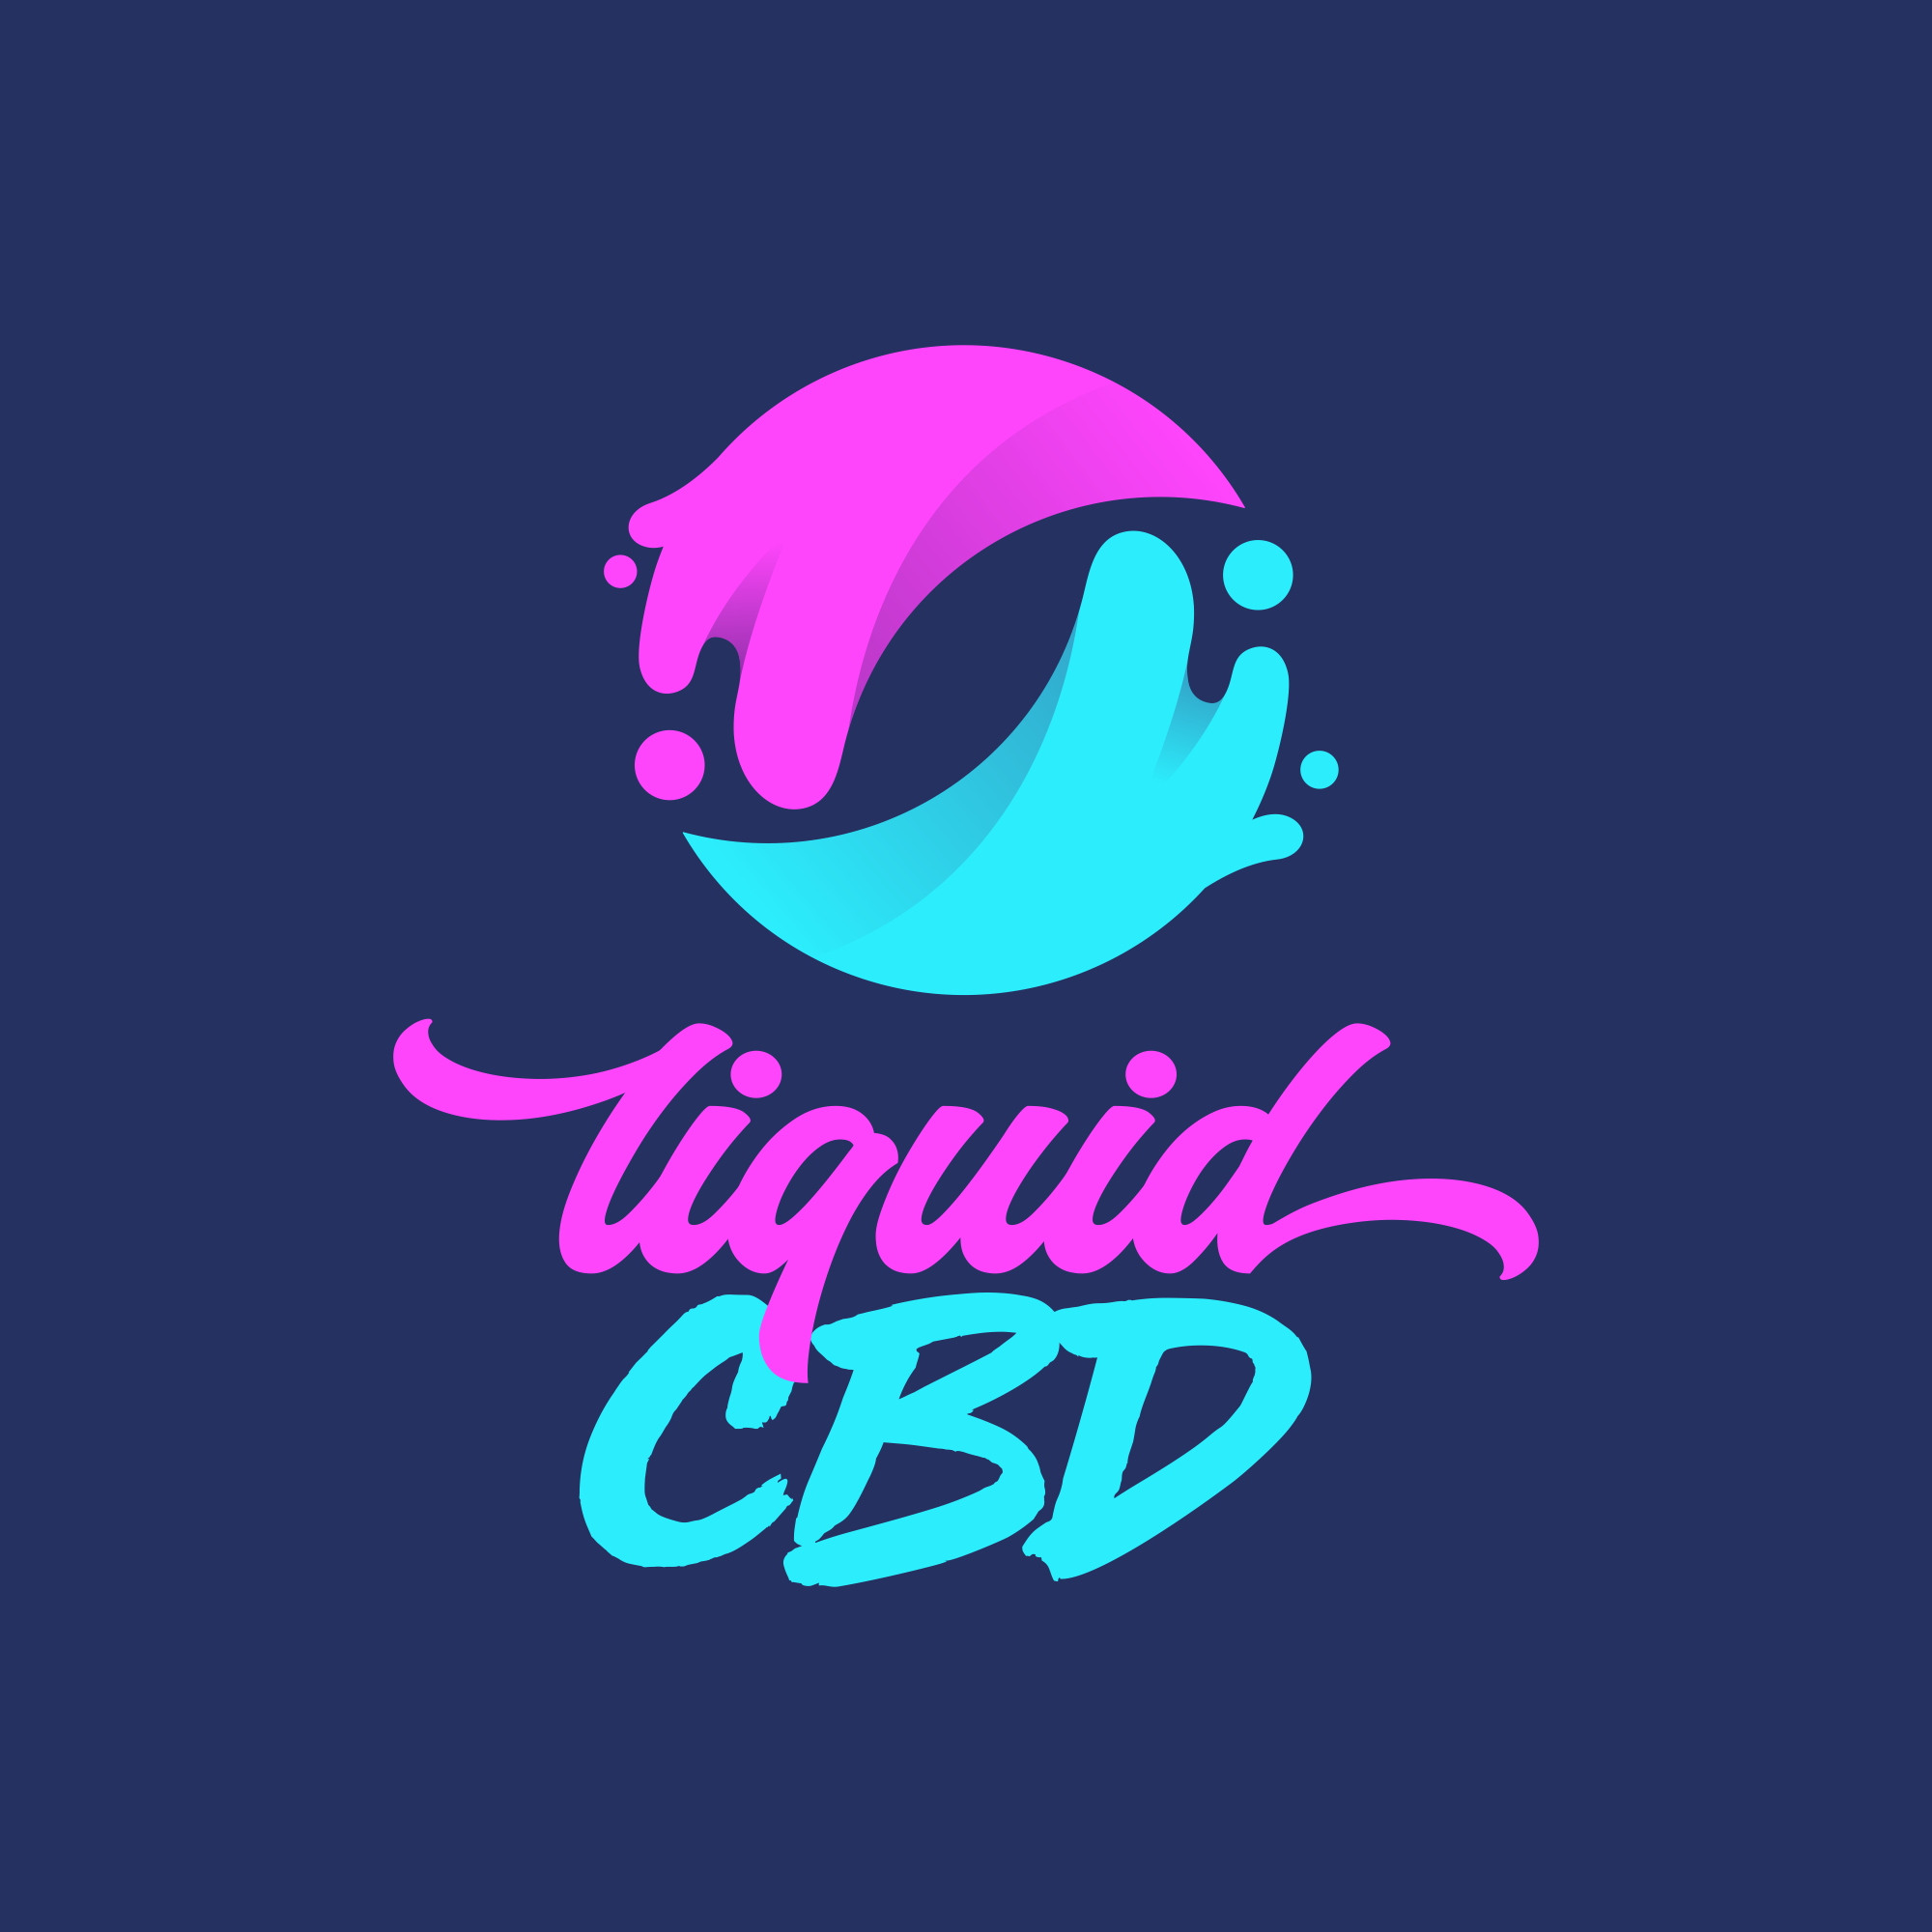 Design a playful yet powerful logo for our award-winning Liquid CBD brand